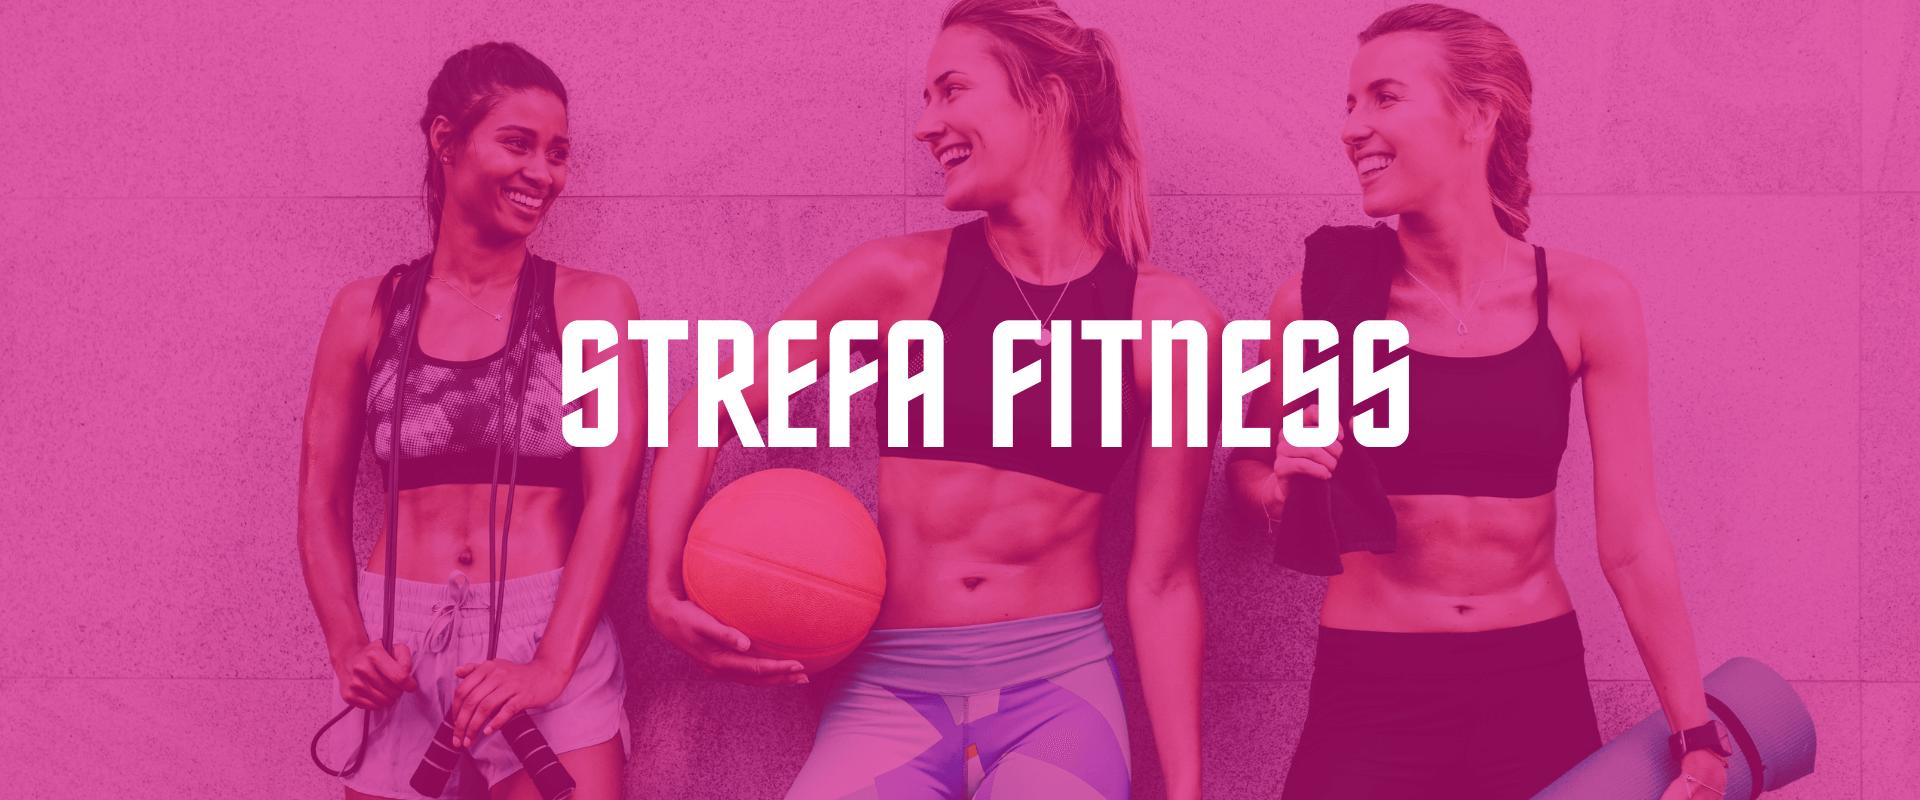 Strefa fitness 3a